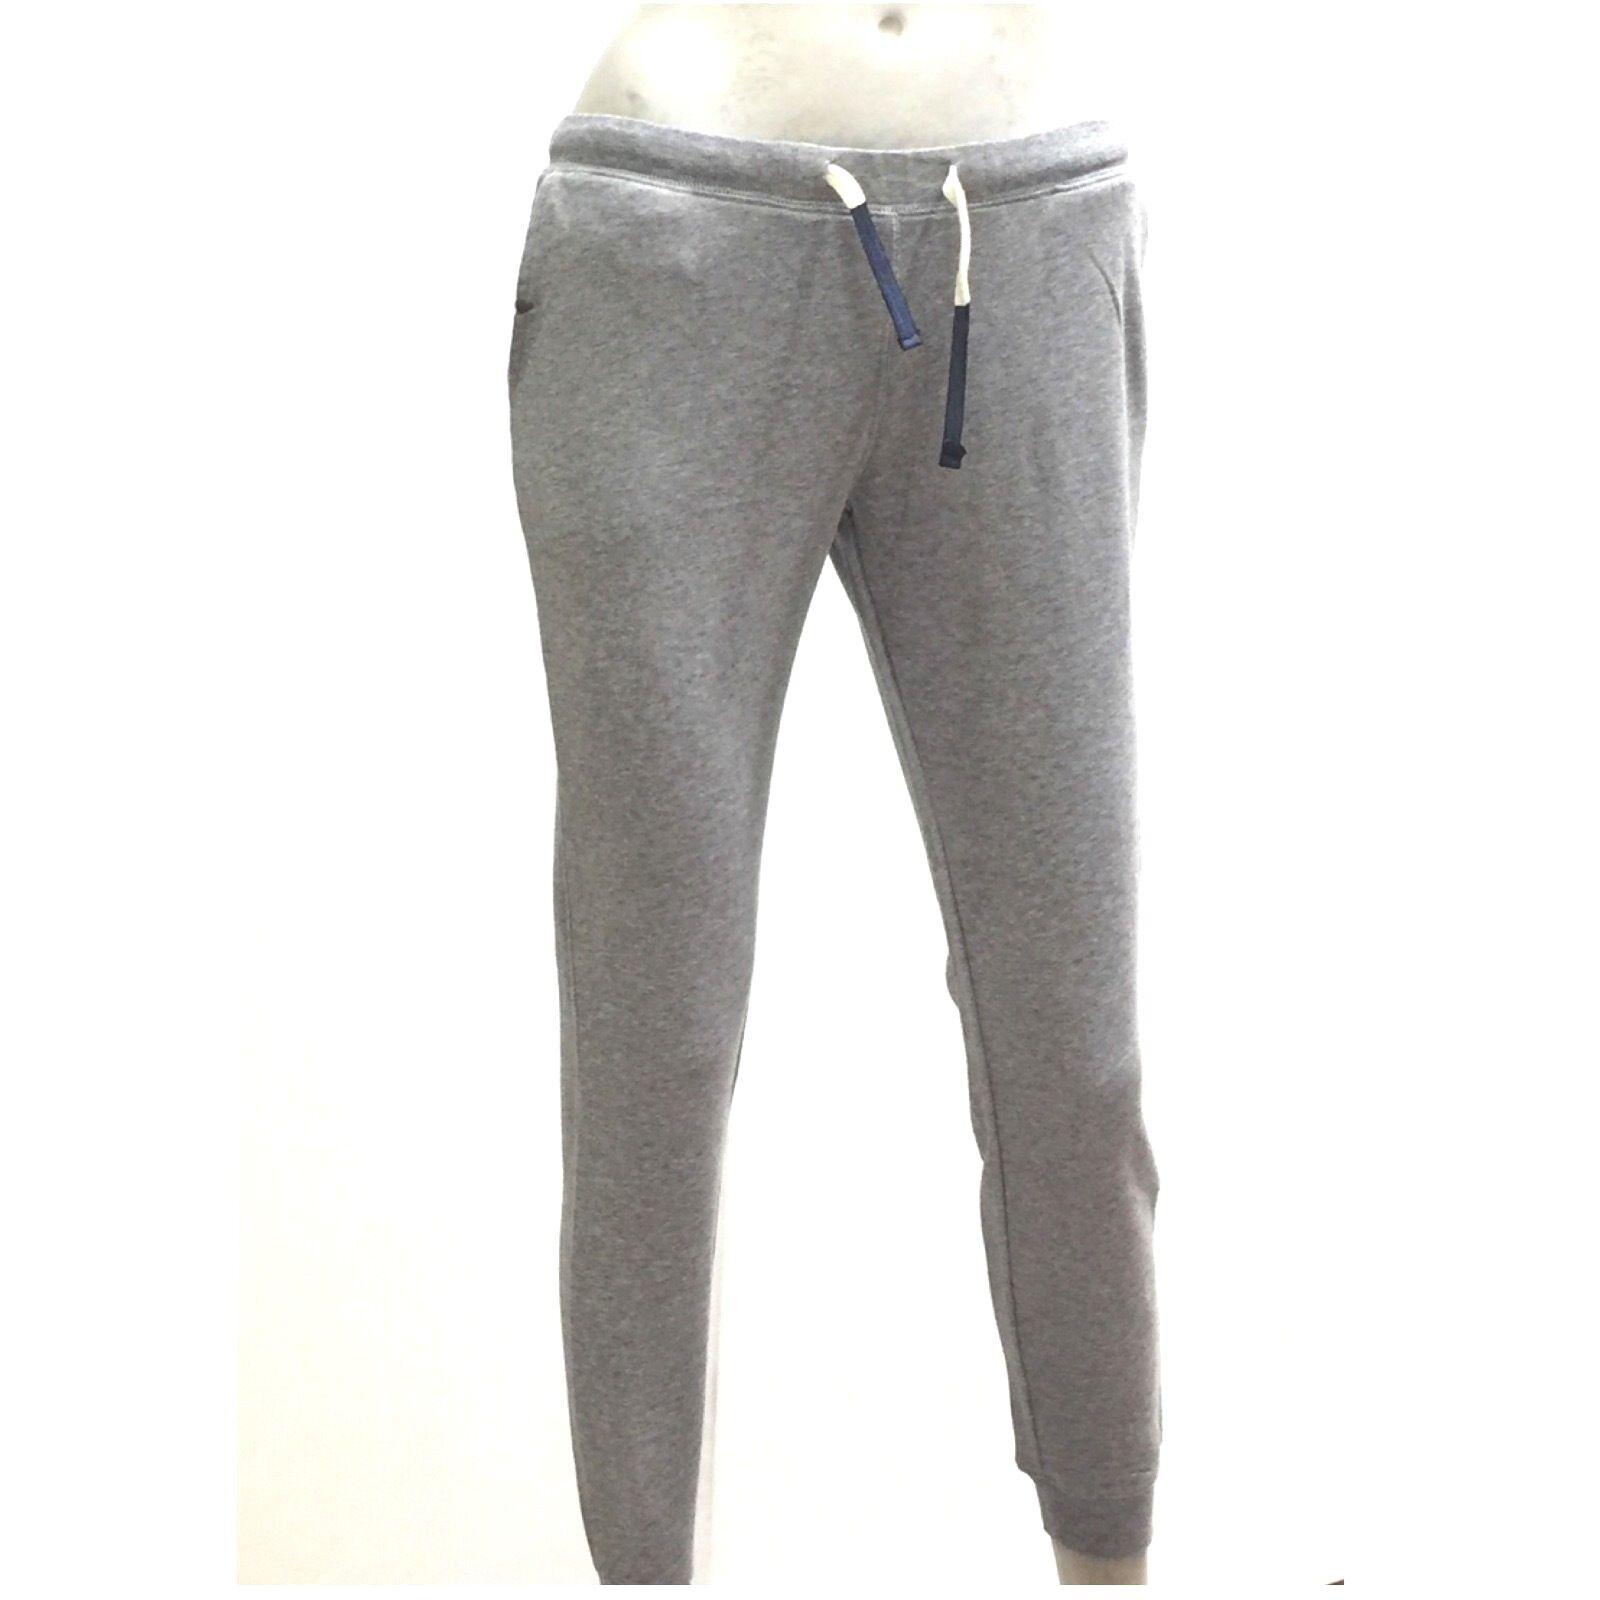 Sun68 Pantalone Lungo per Sport in Felpa femmes gris Long Pant Sport Cott.17251